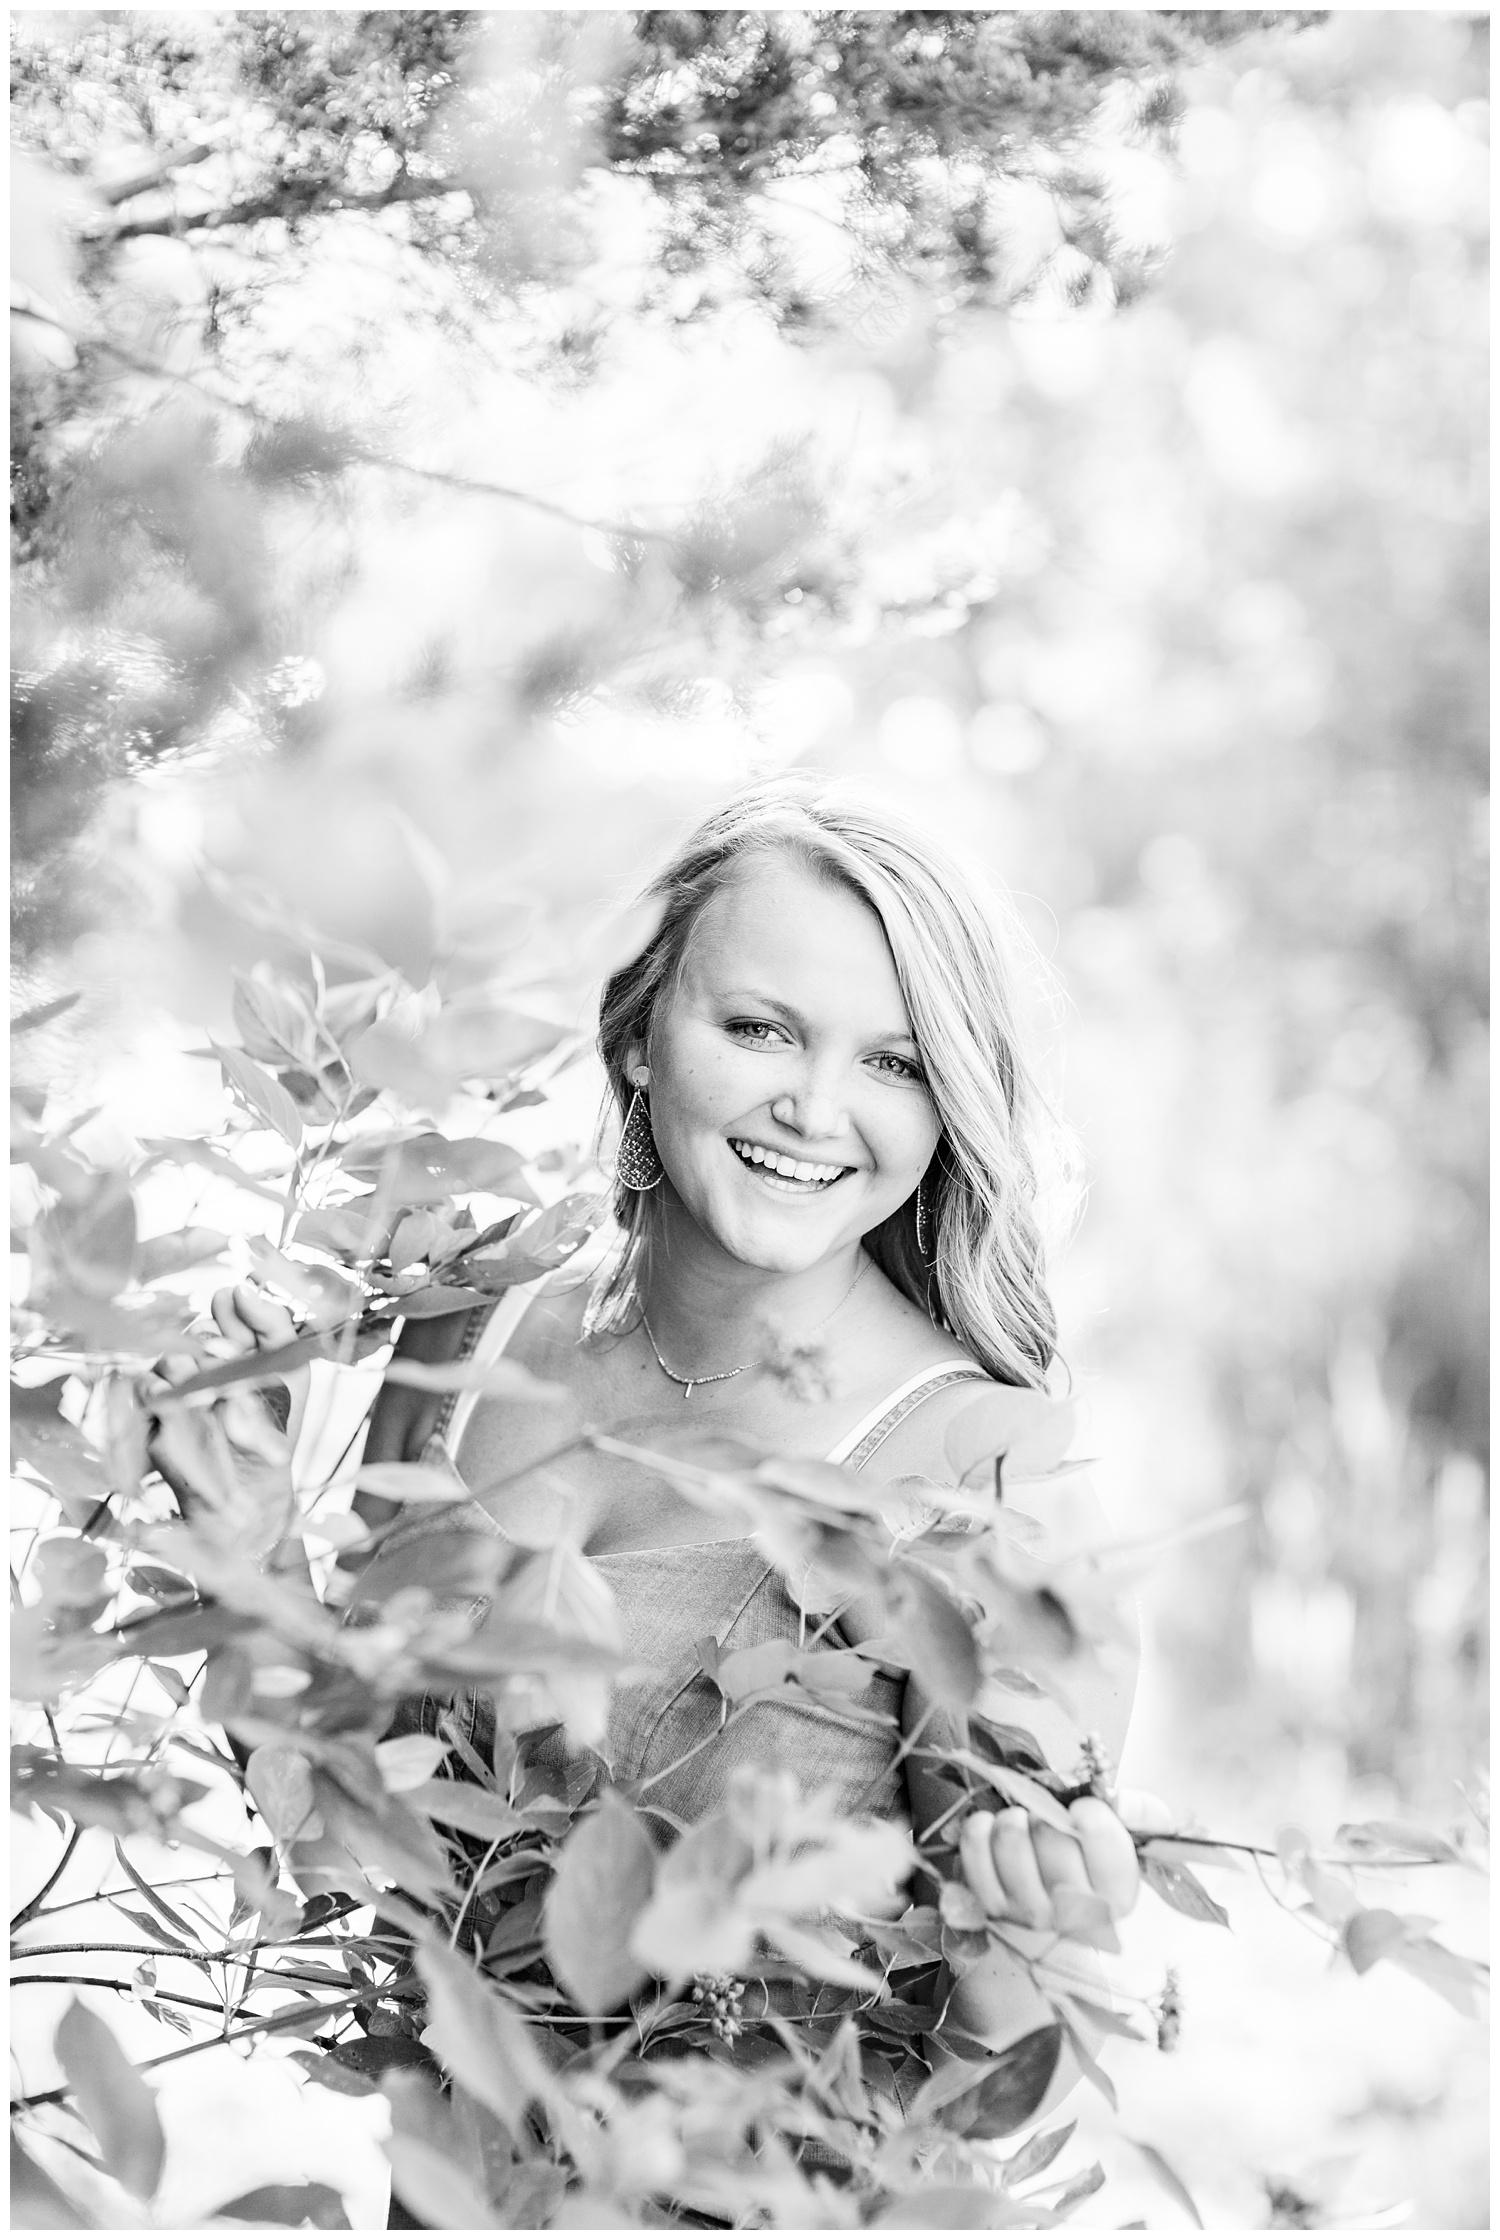 Senior girl wearing laughing behind a tree branch at Smith Lake, Algona, Iowa | CB Studio